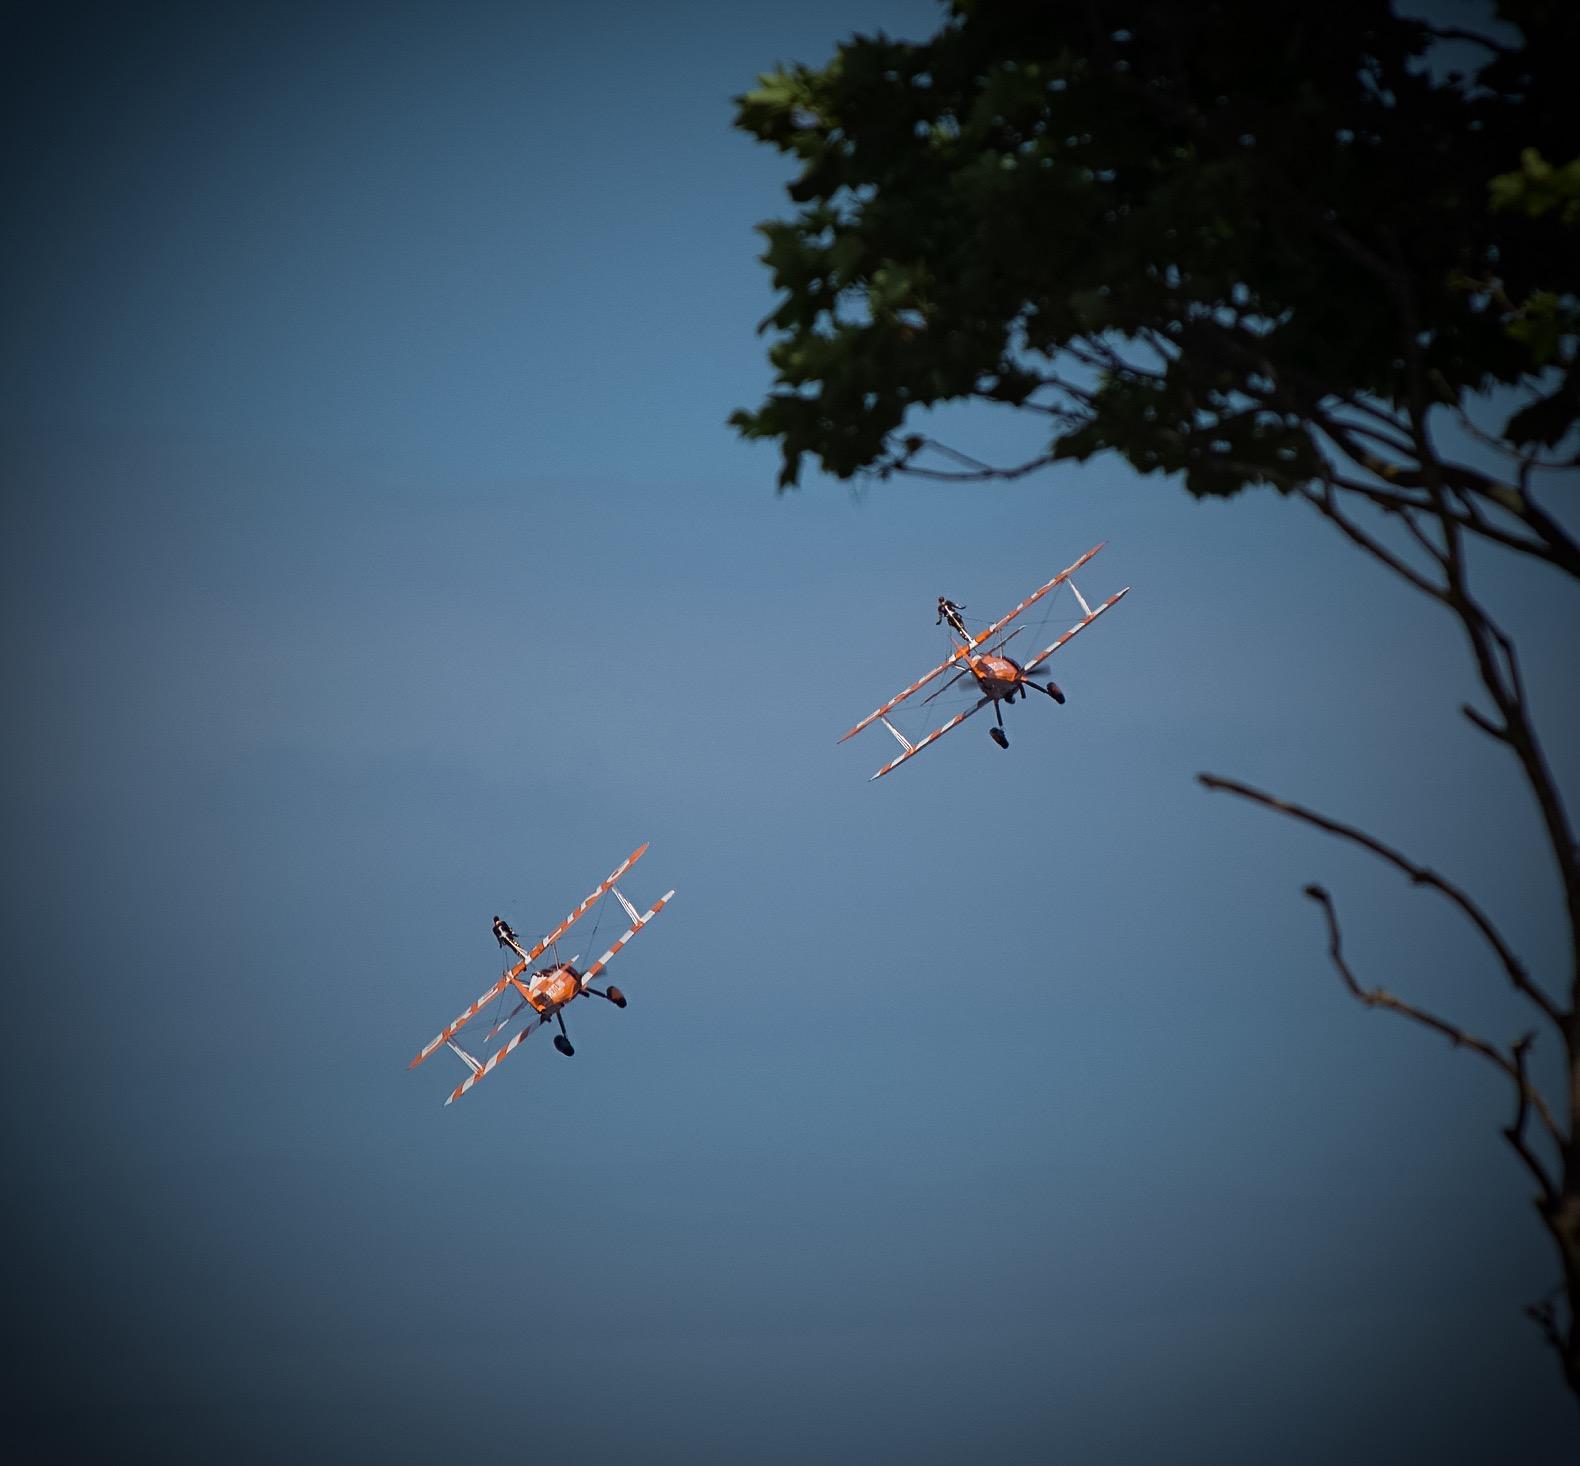 Wingwalkers at Torbay Airshow